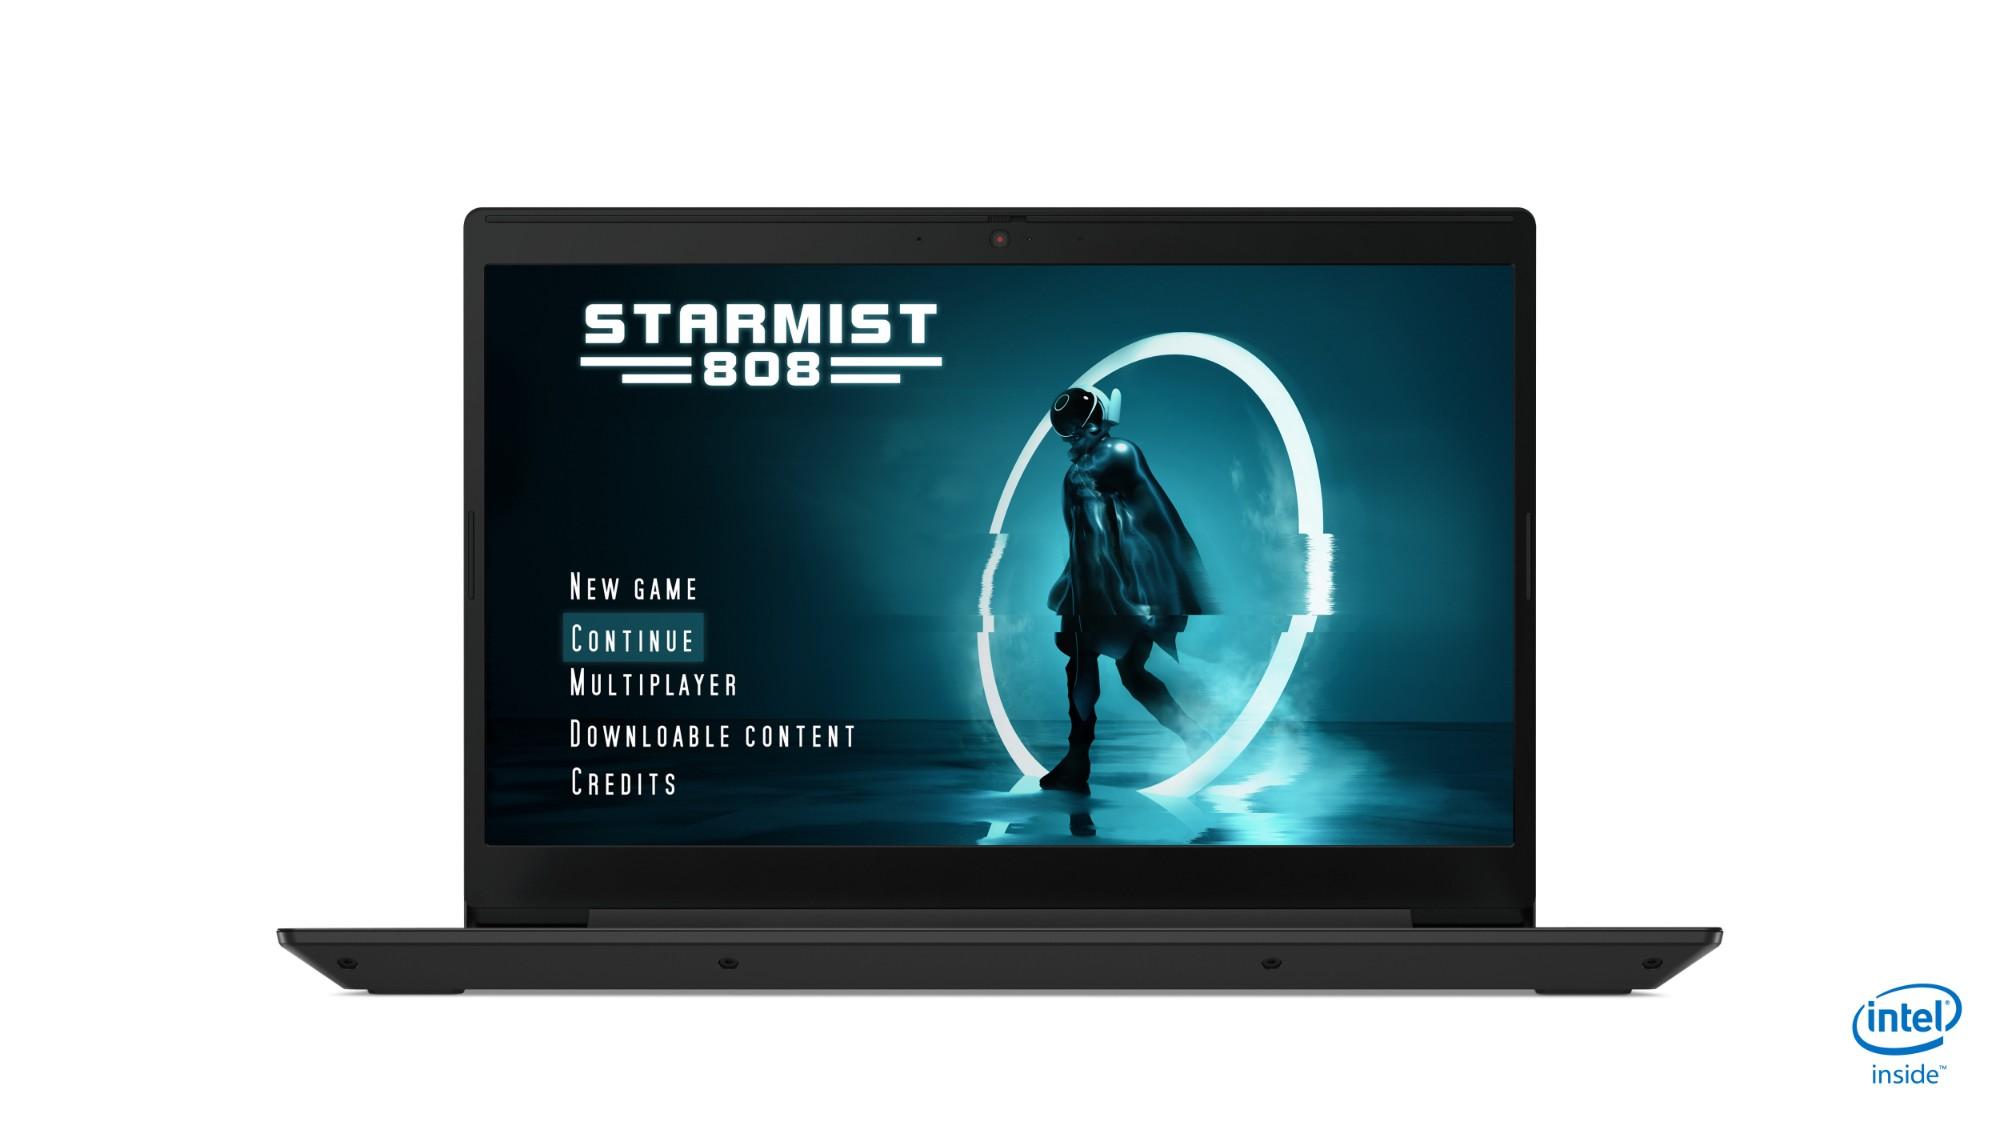 "Lenovo IdeaPad L340 Notebook 39.6 cm (15.6"") Full HD 9th gen Intel-� Core��� i5 8 GB DDR4-SDRAM 256 GB SSD NVIDIA-� GeForce-� GTX 1650 Wi-Fi 5 (802.11ac) Windows 10 Home Black"